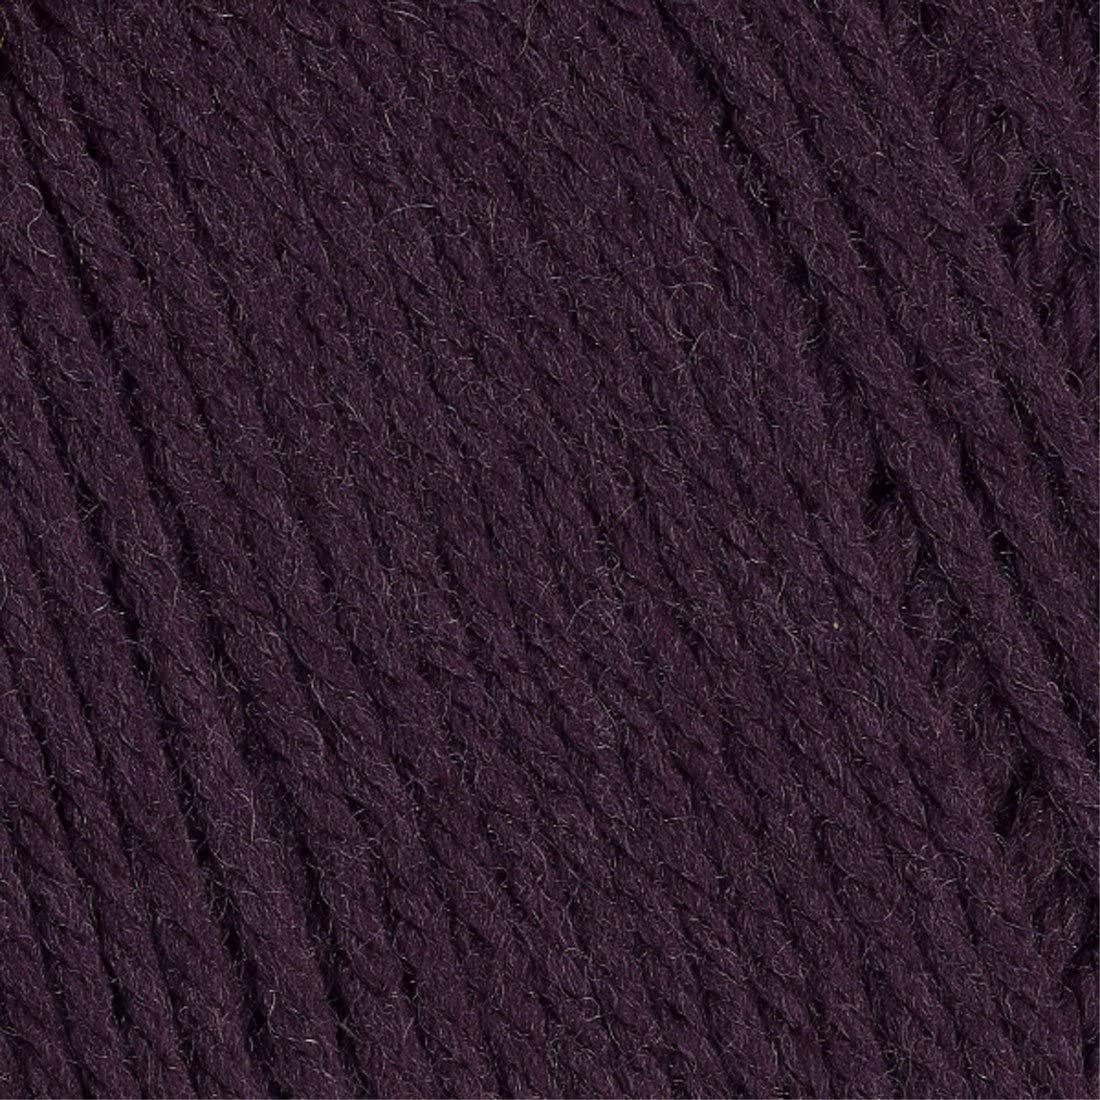 Pure Wool DK-Damson